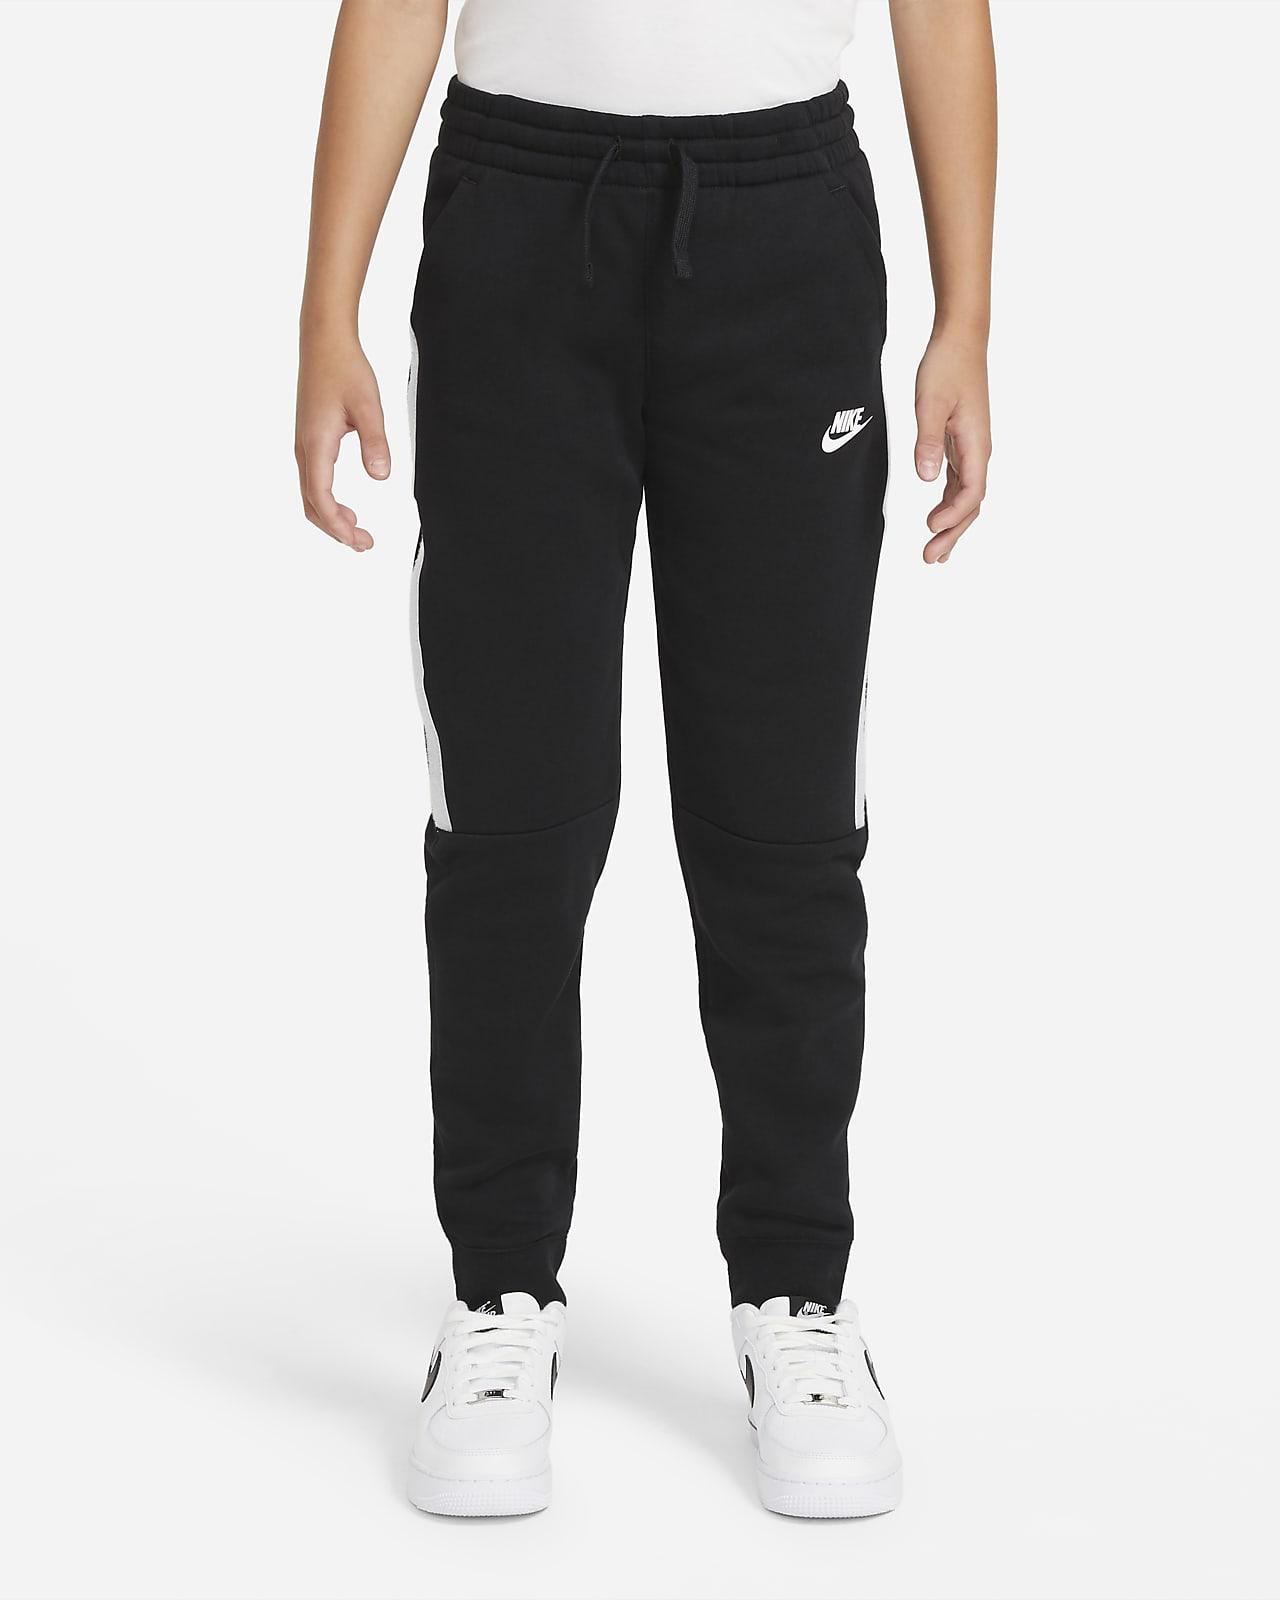 Nike Sportswear AF1 Big Kids' Joggers